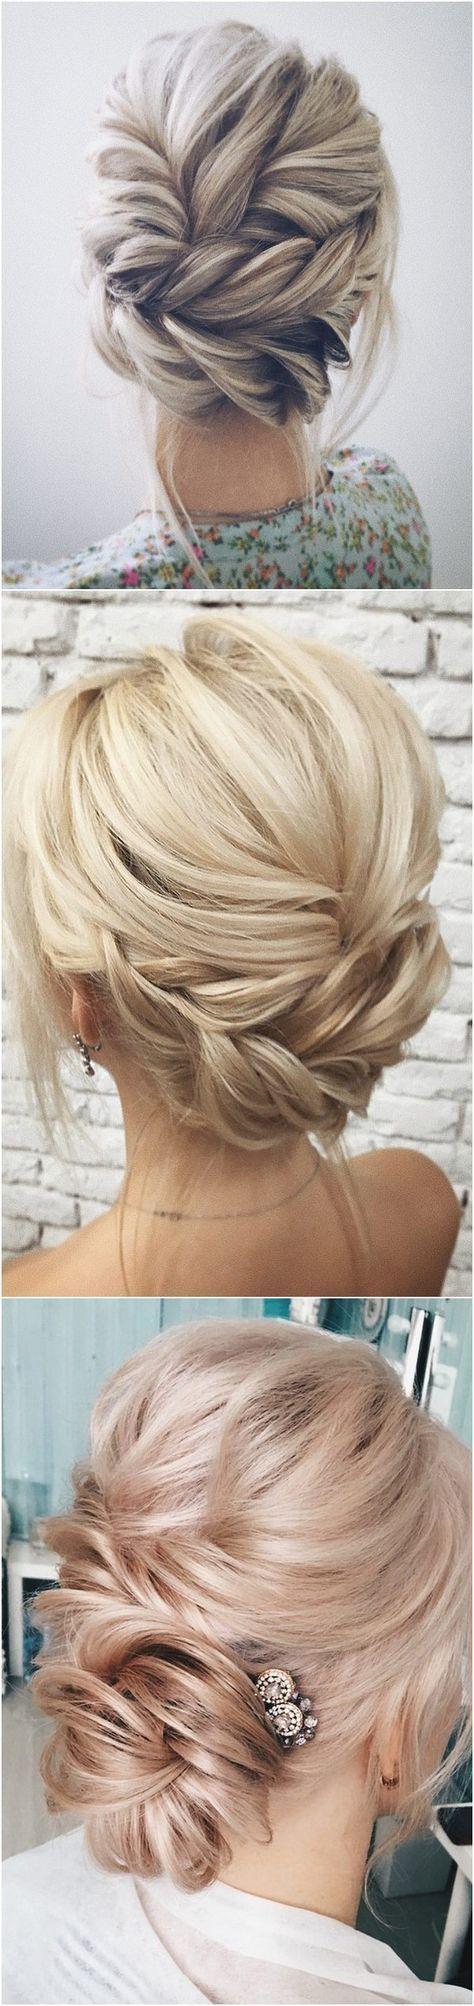 twisted wedding updo hairstyle Hair style Pinterest Wedding